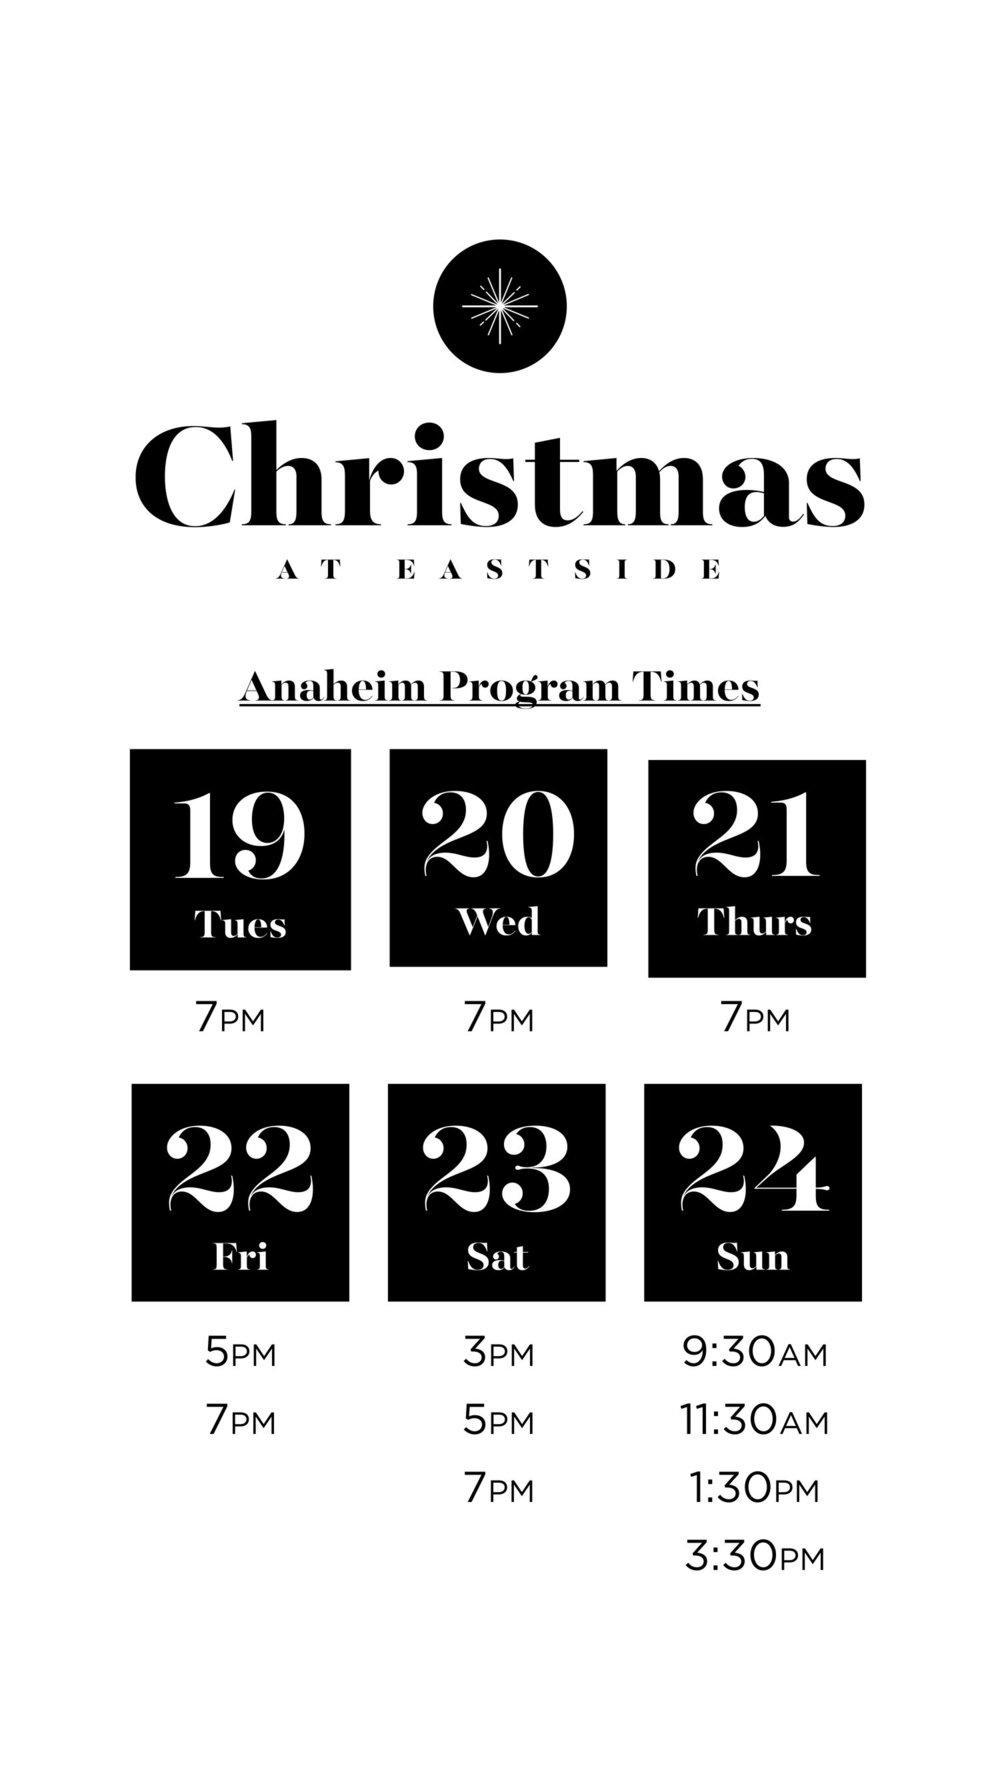 ChristmasAtEastsideInstaStory6.jpg